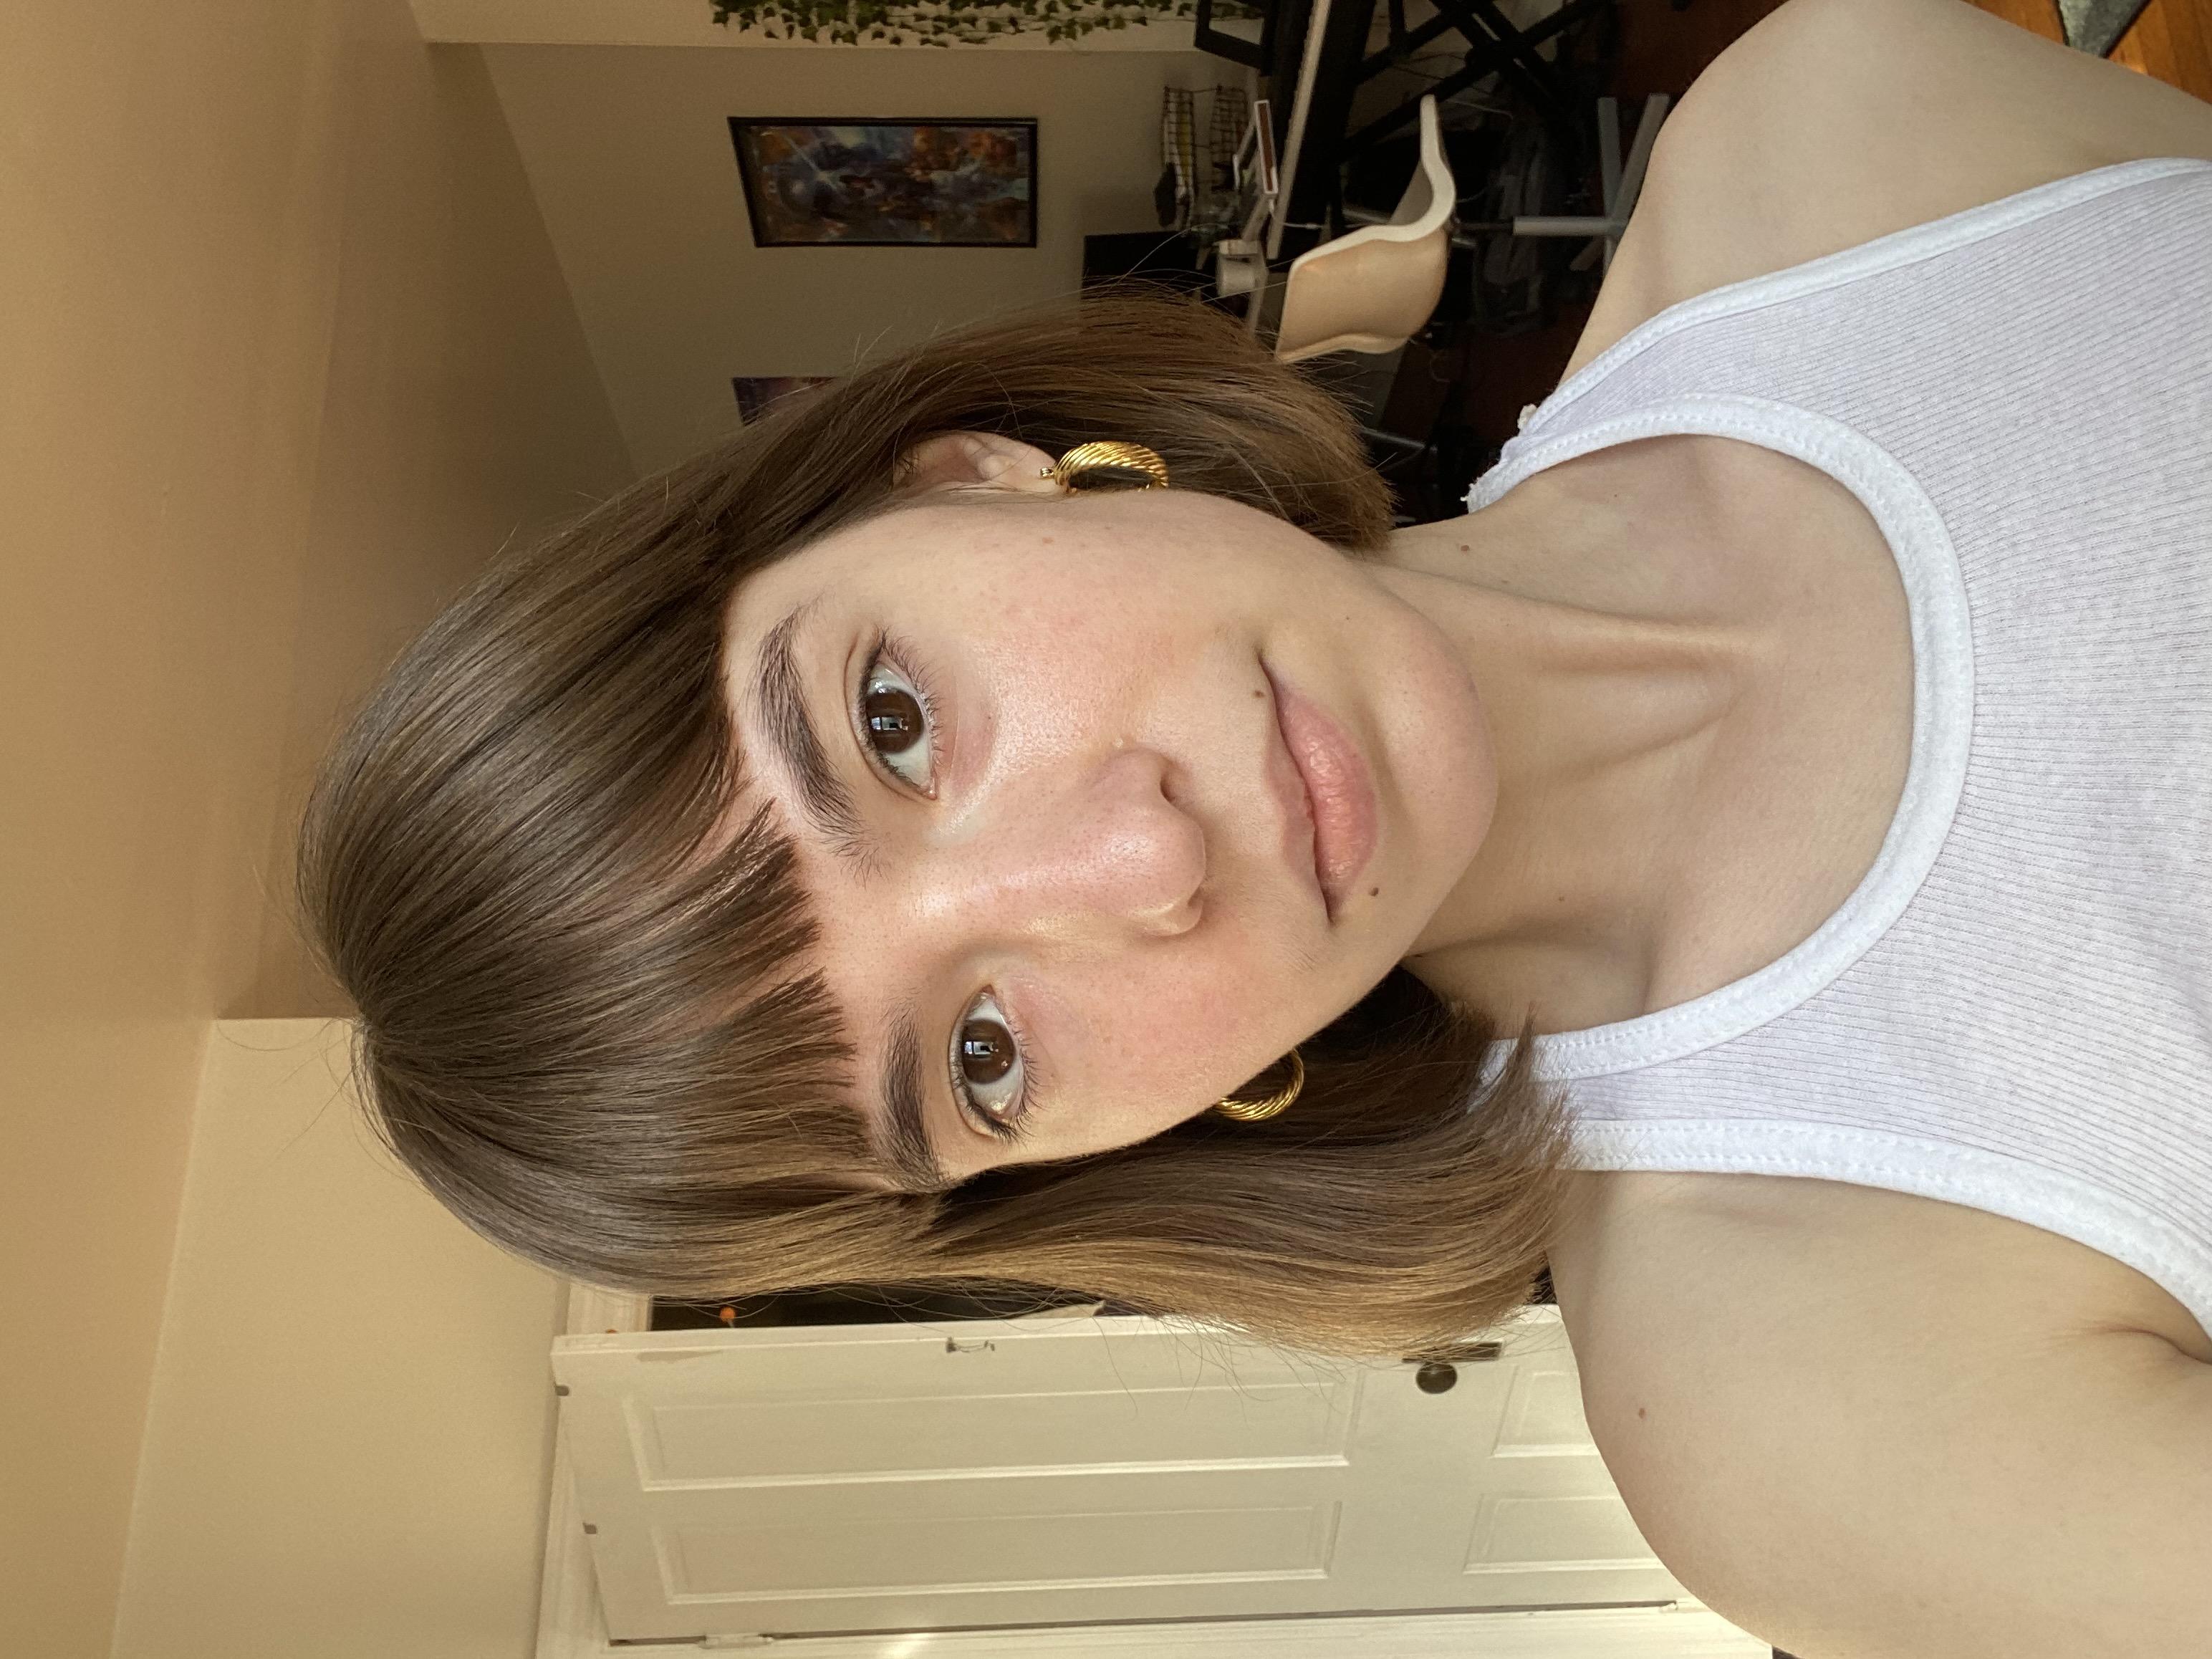 Erin Renee Russo, headshot via Editor, 12:39:49 AM 5/27/2021